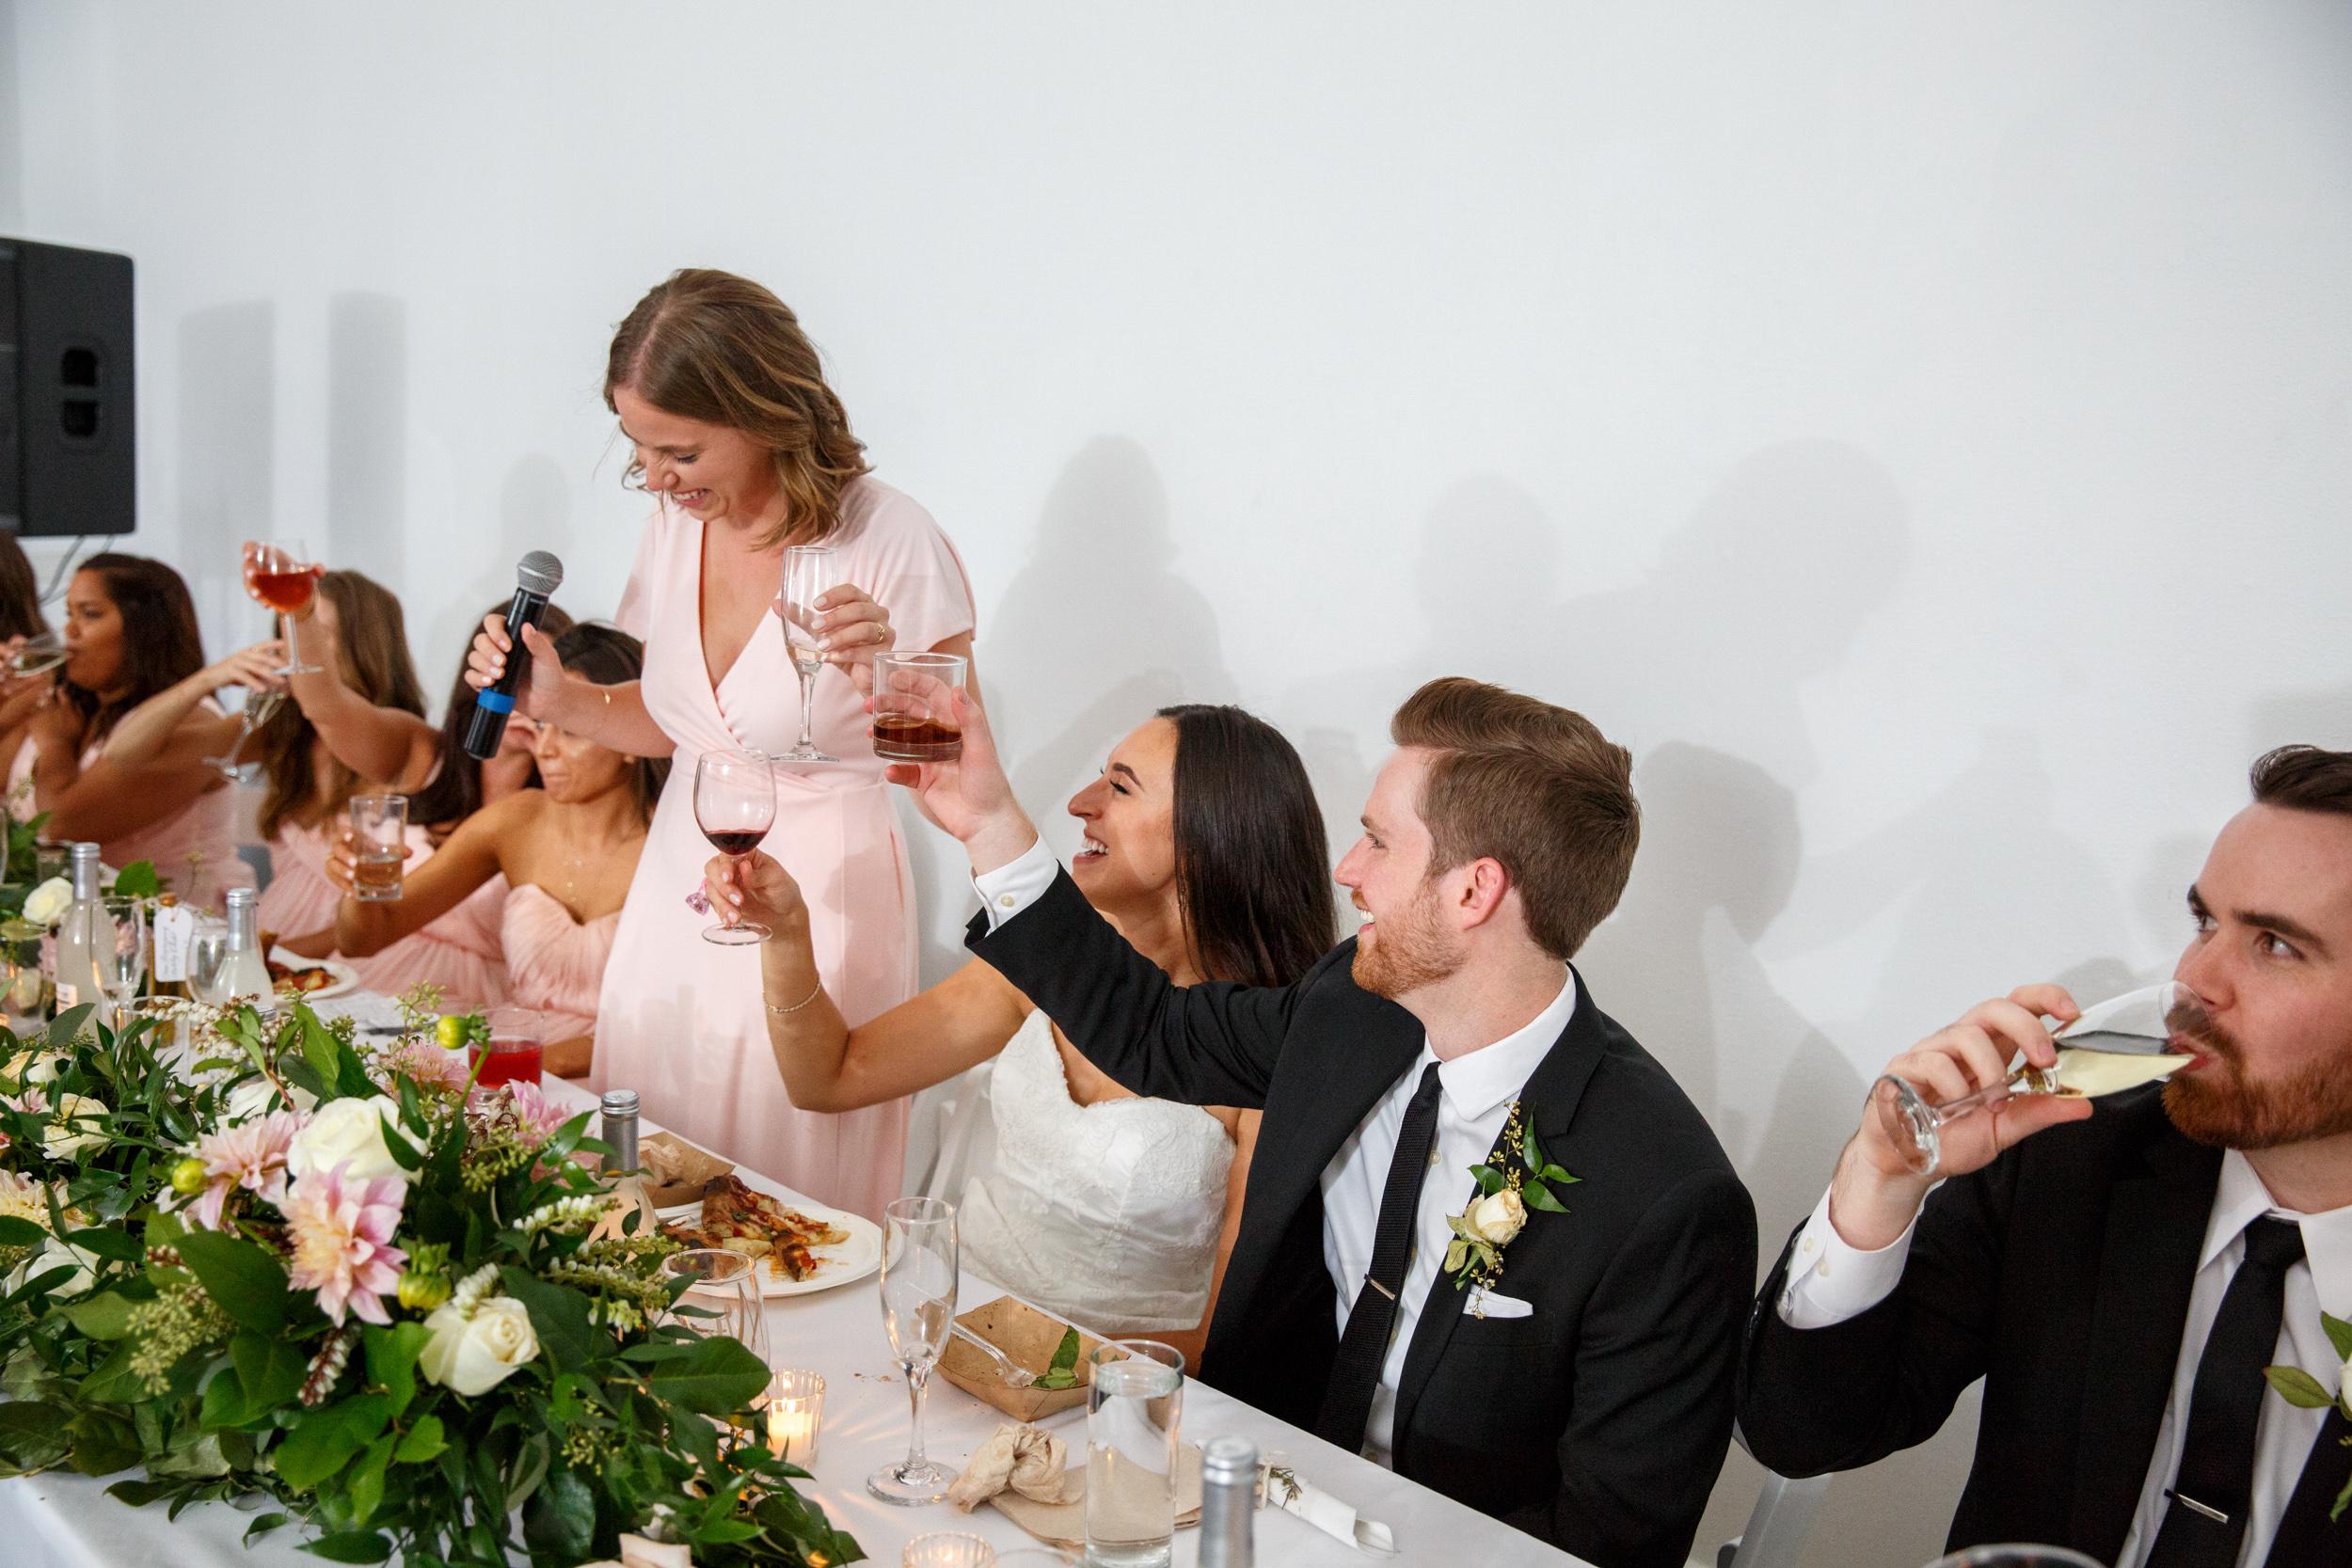 9-09-2016 Flora & Colin wedding photography by Brian Milo-179.jpg